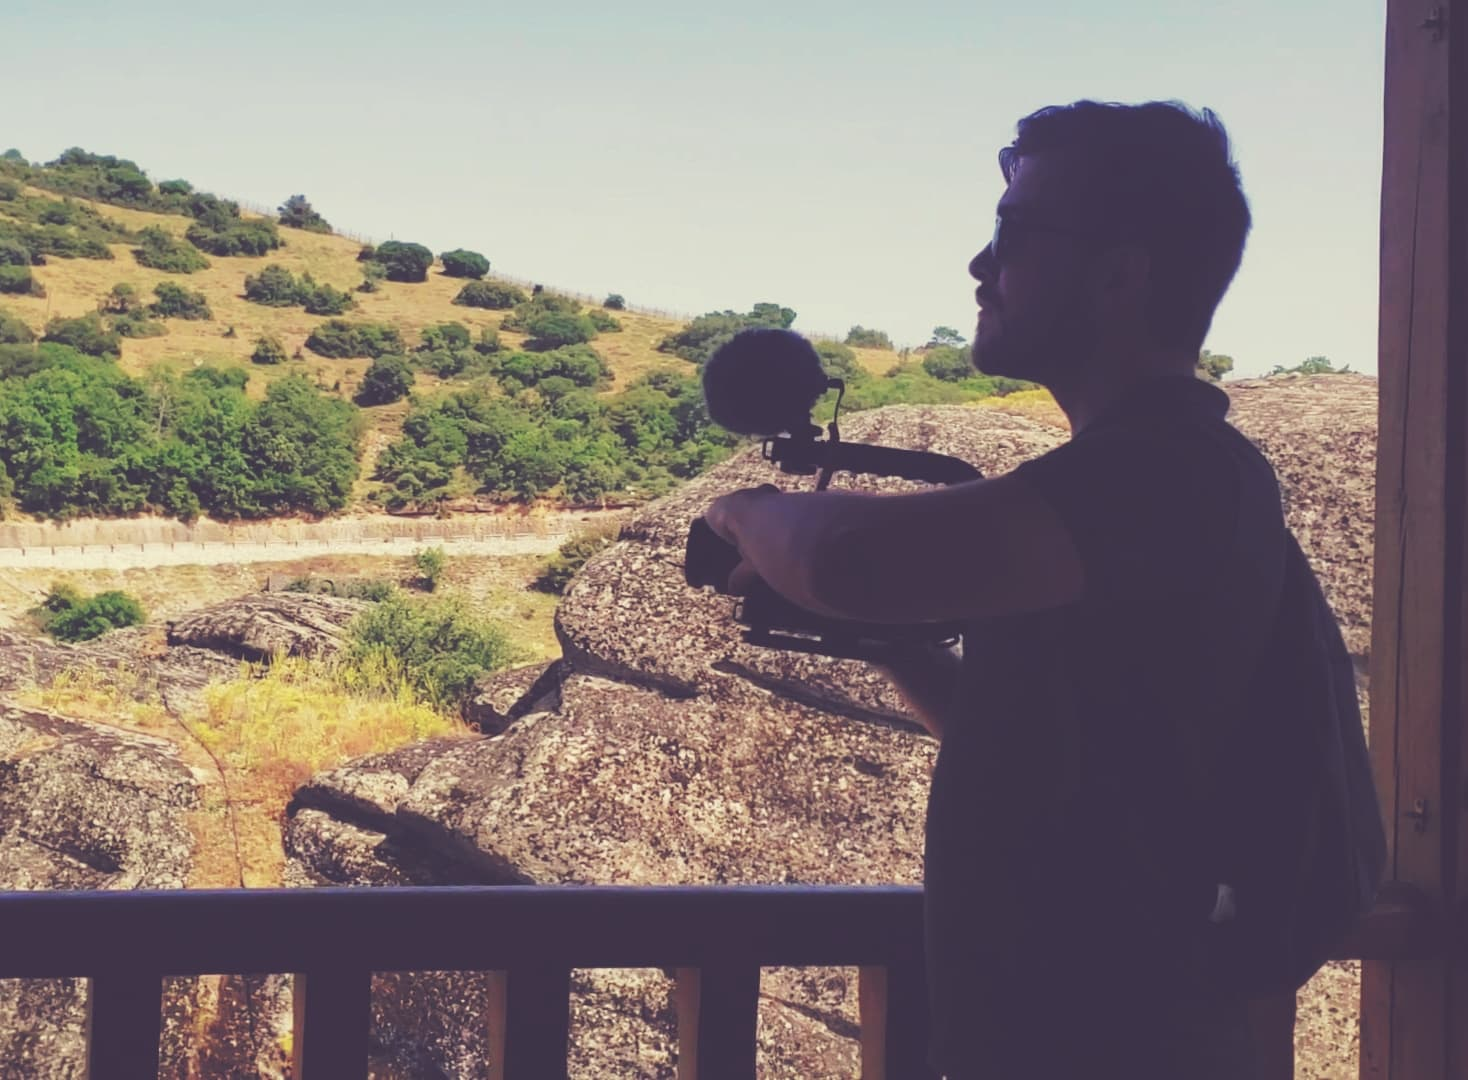 Luke Filming